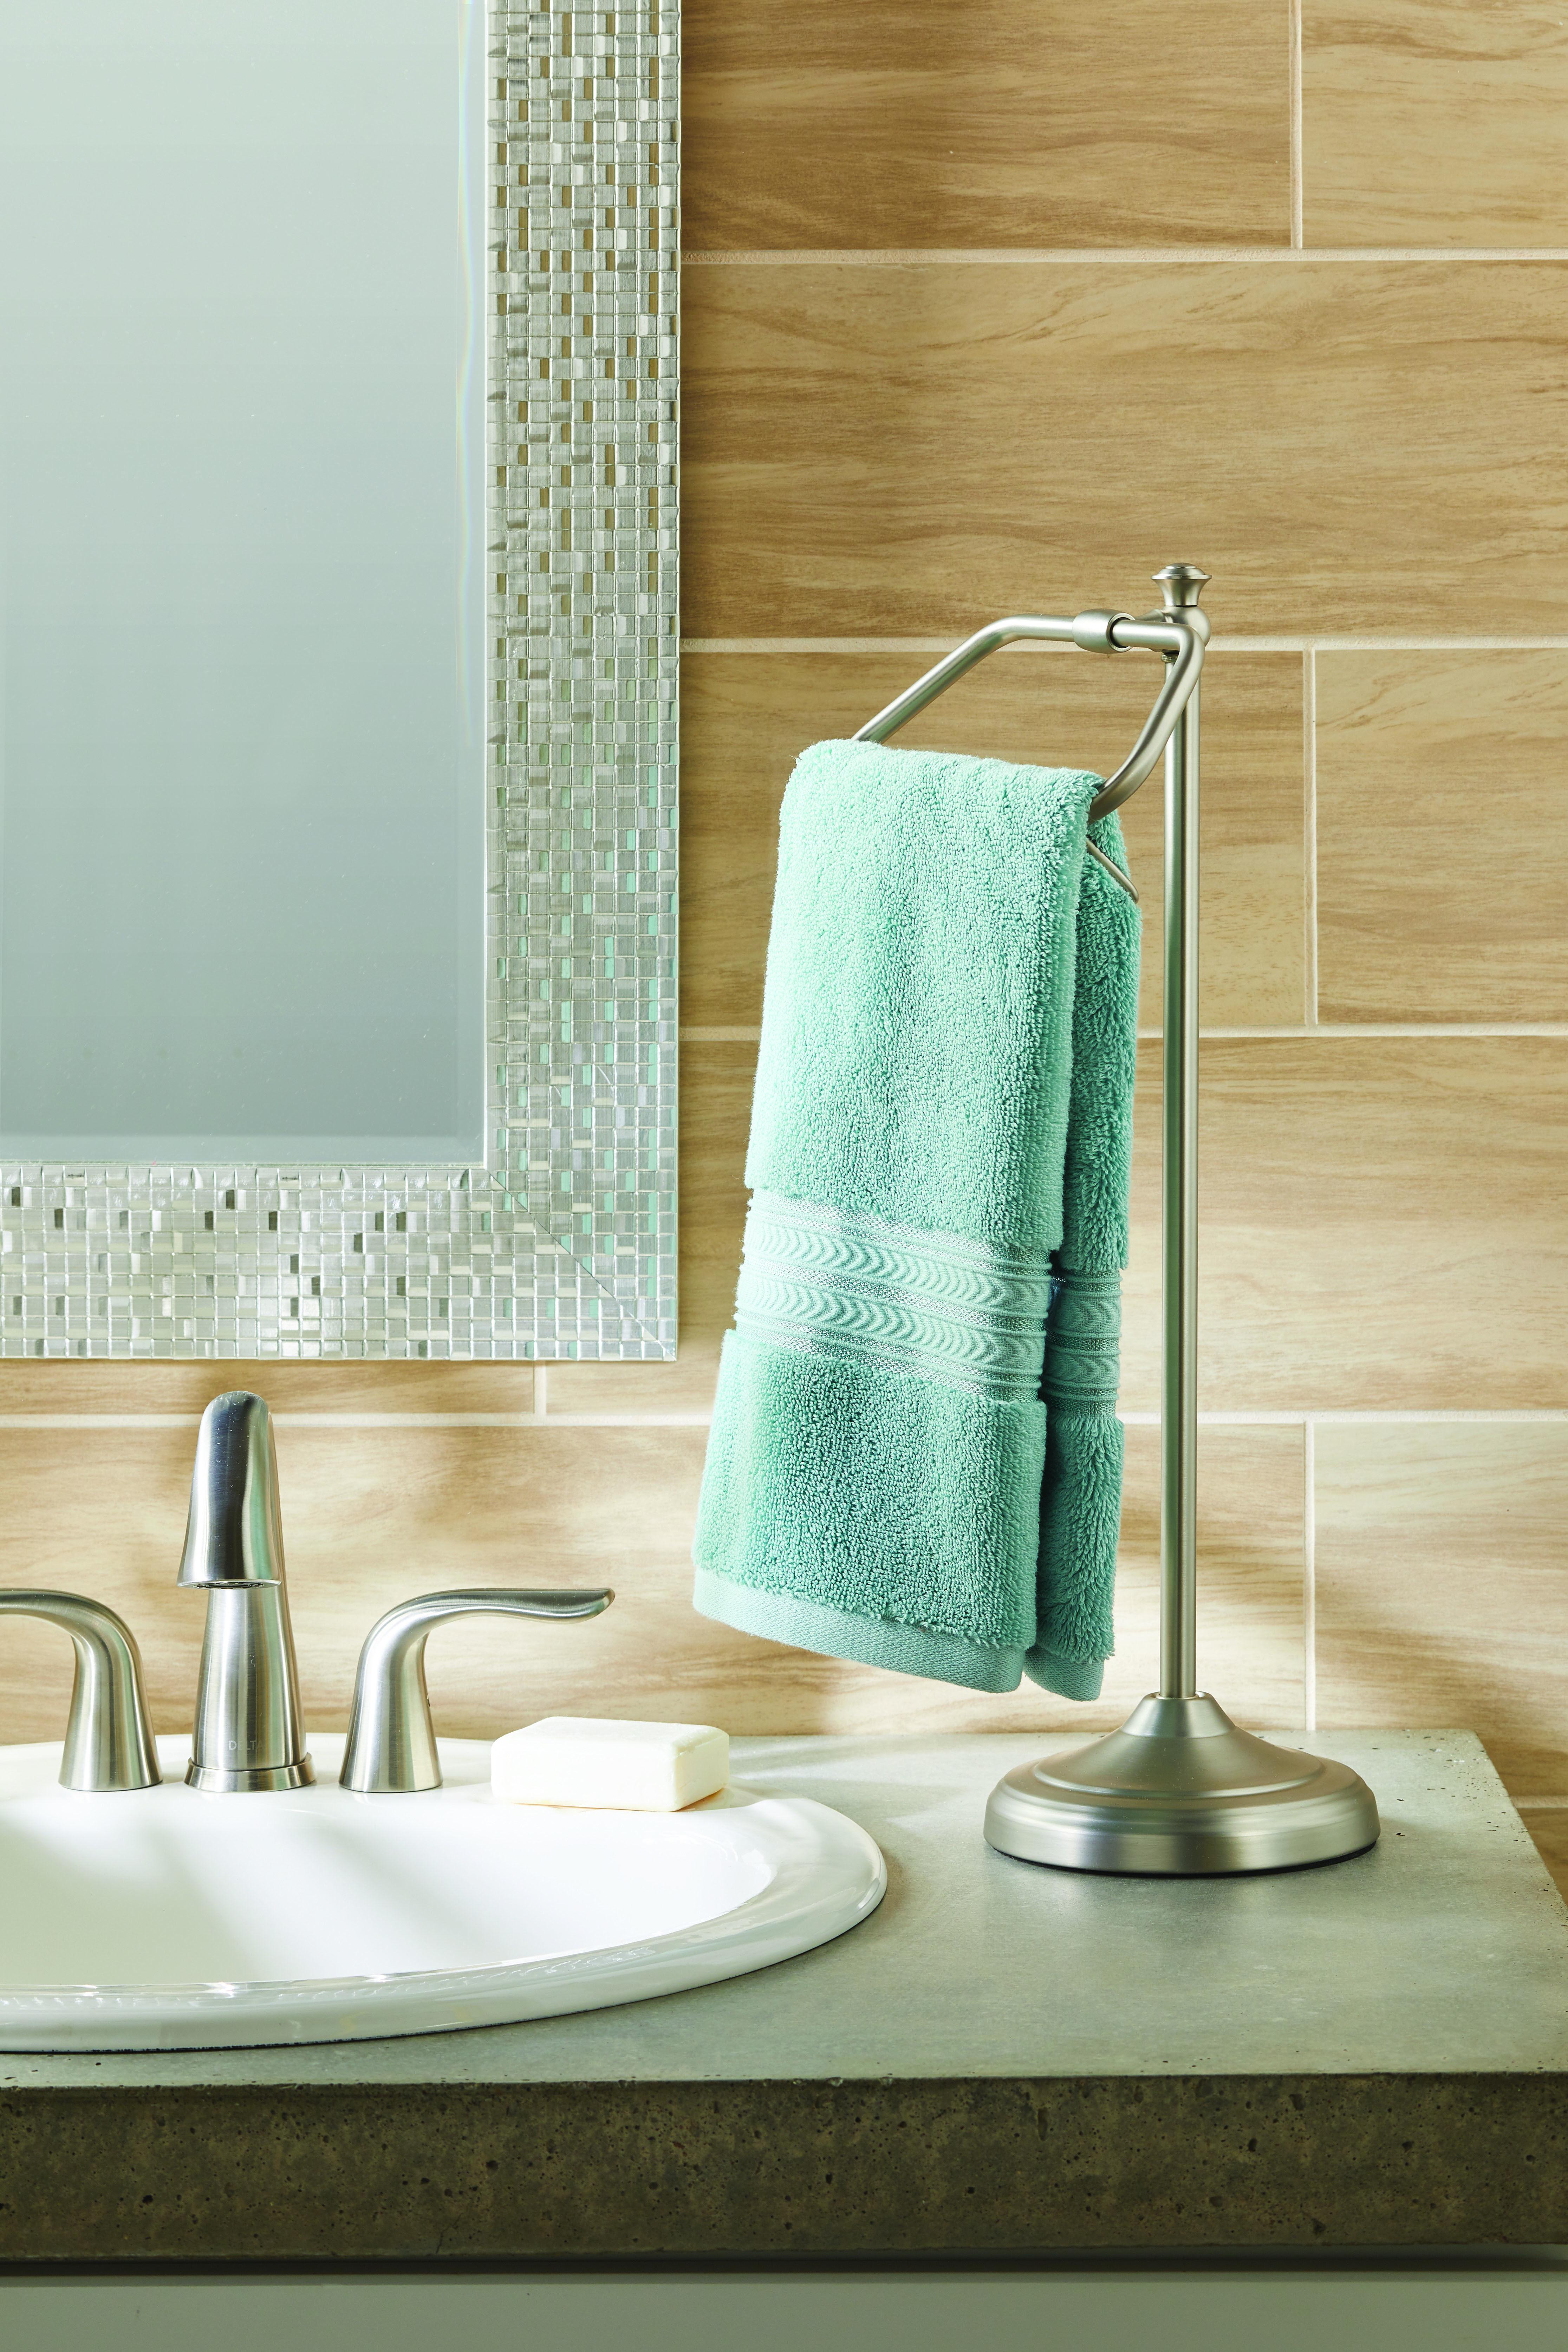 Better Homes Garden Hand Towel Holder Satin Nickel Walmart Com Bathroom Hand Towel Holder Hand Towels Bathroom Hand Towel Holder Bathroom hand towel holder